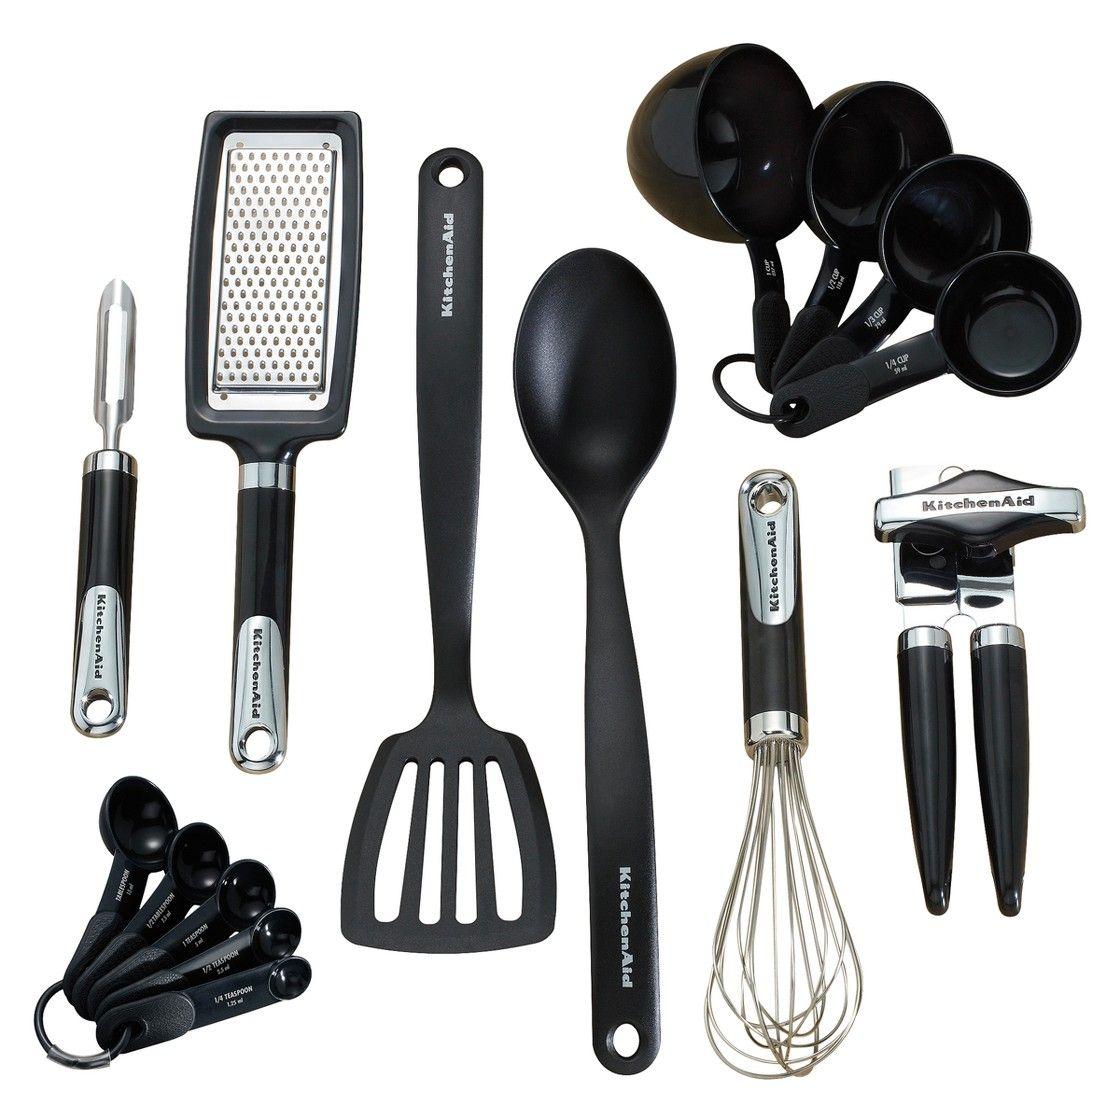 Kitchenaid black 15pc kitchen tool gadget set kitchen